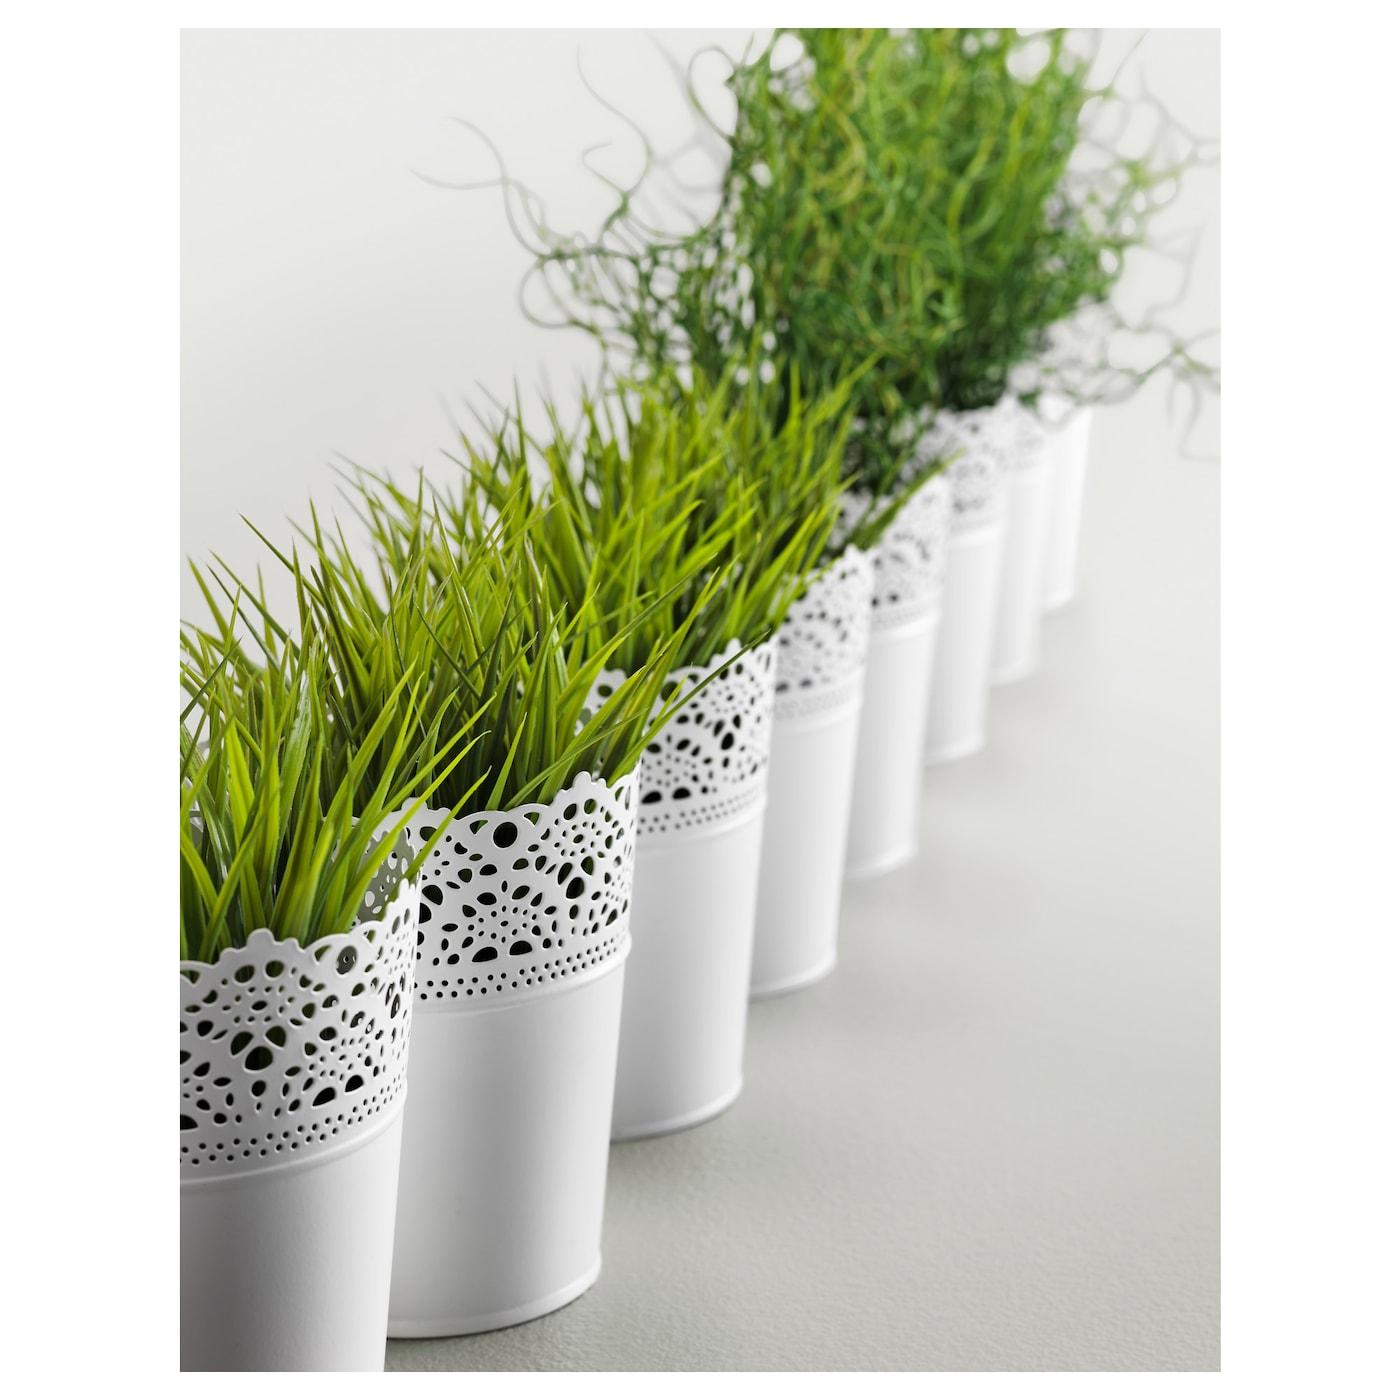 skurar cache pot int rieur ext rieur blanc cass 10 5 cm ikea. Black Bedroom Furniture Sets. Home Design Ideas